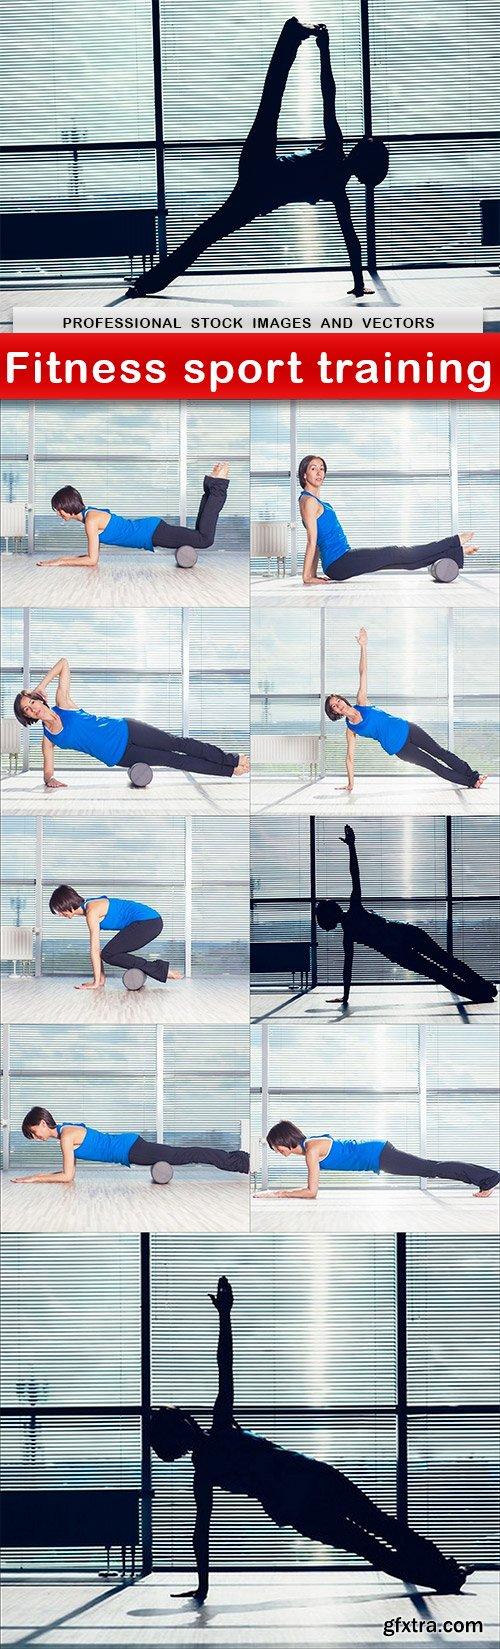 Fitness sport training - 10 UHQ JPEG